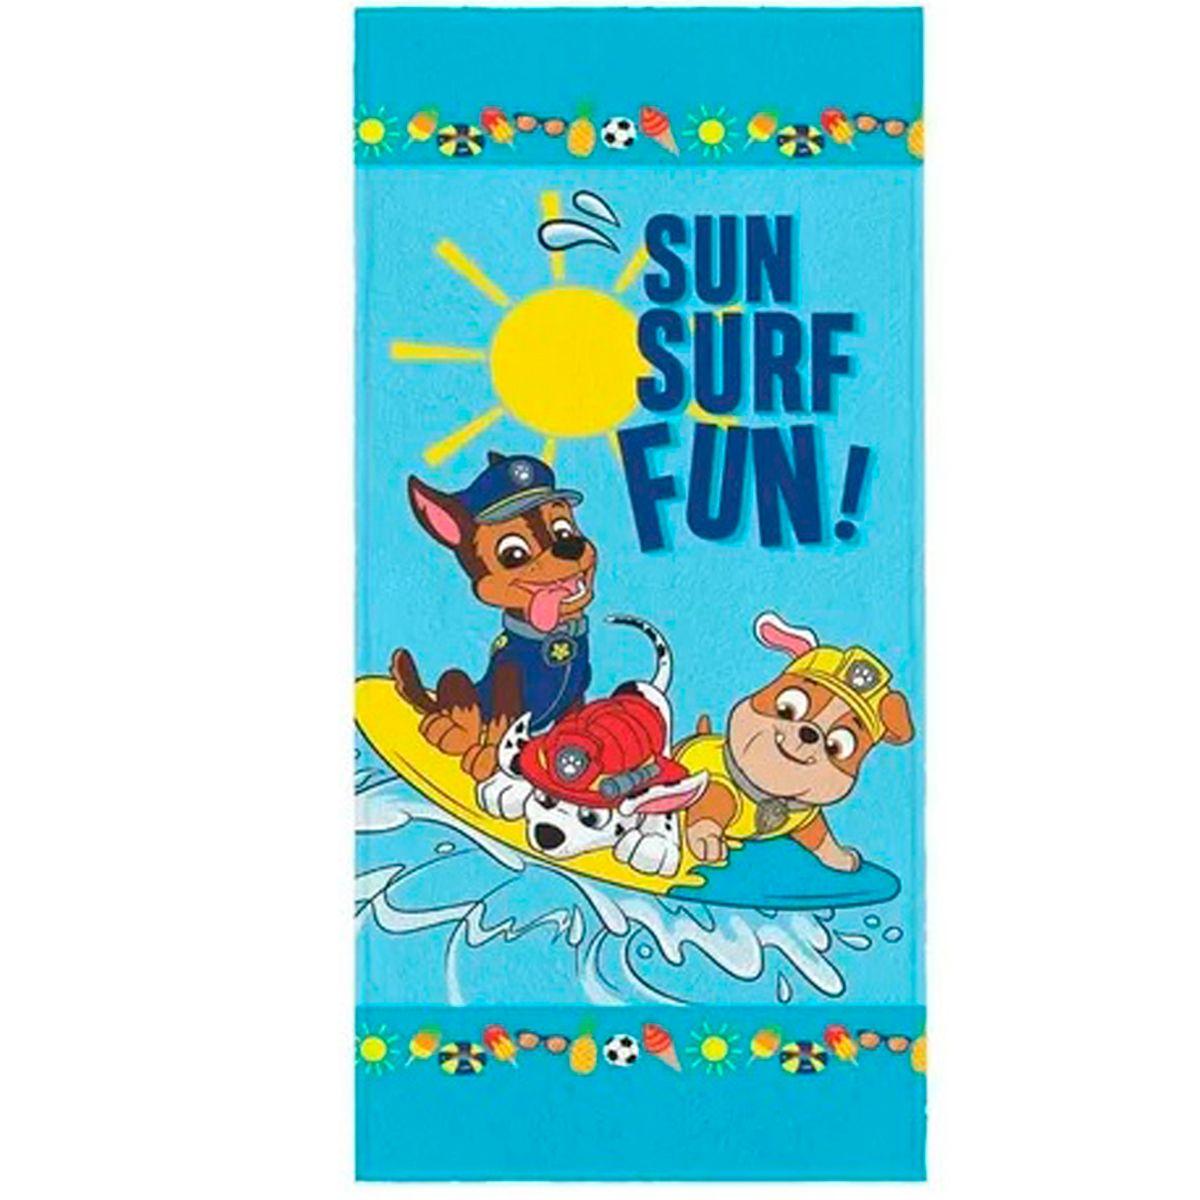 Toalha de Banho Infantil Felpuda Patrulha canina Sun Surf